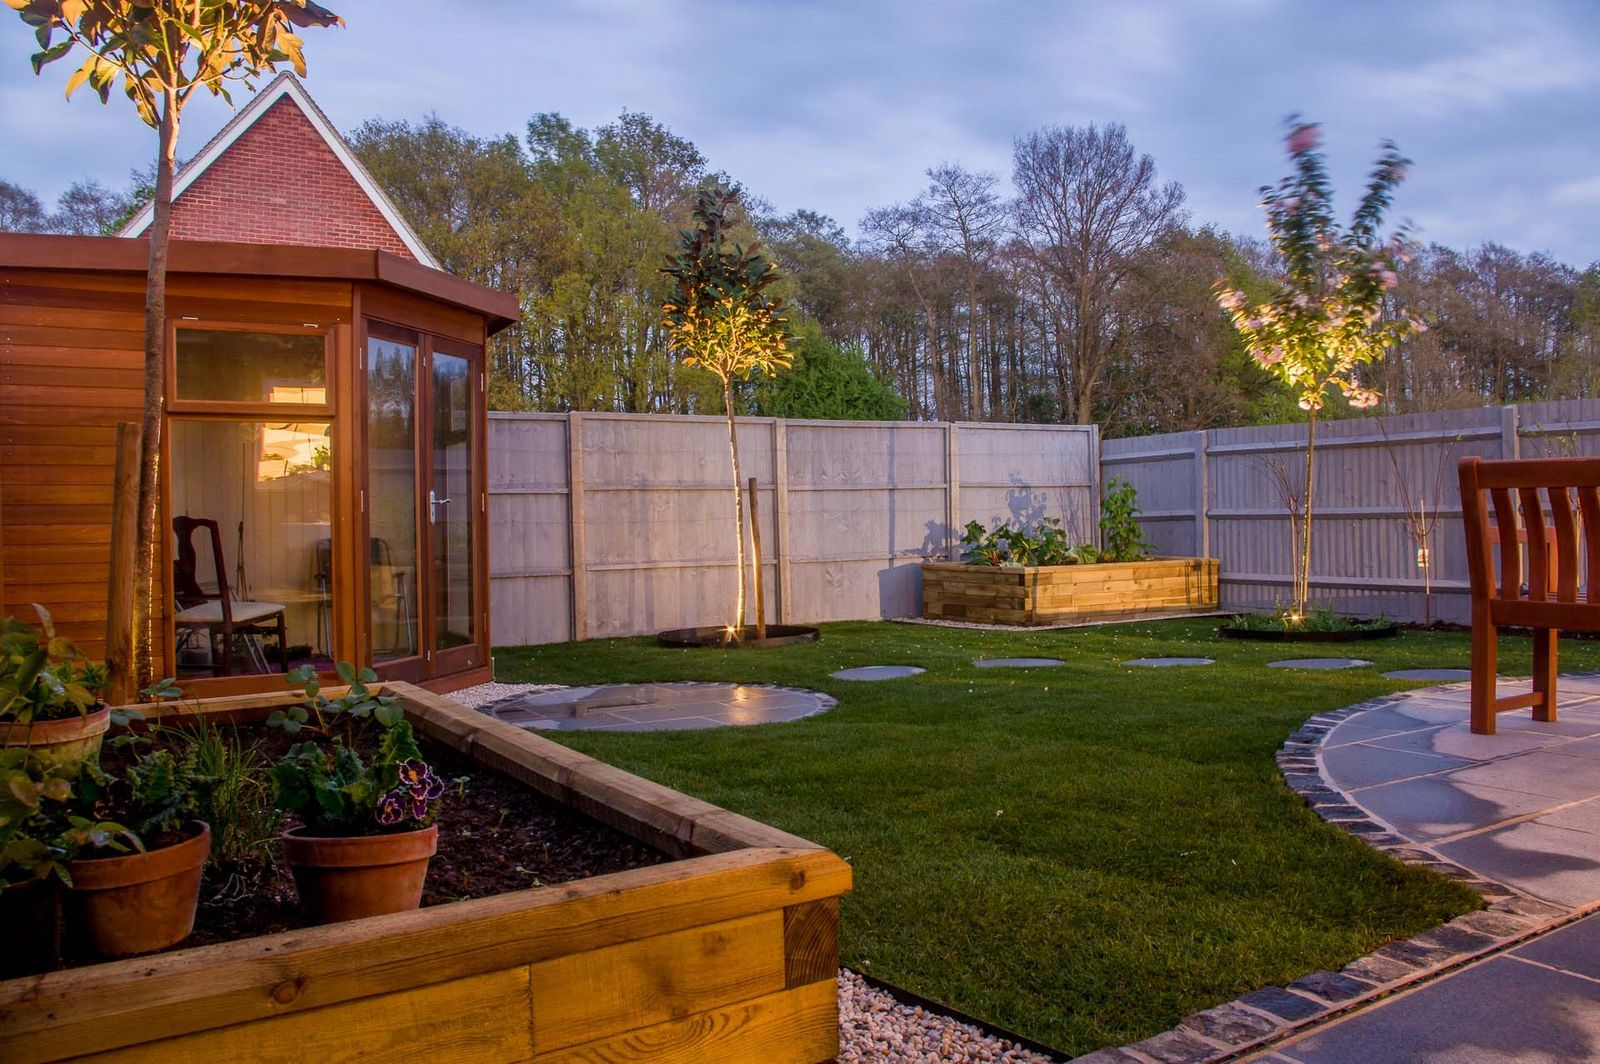 Malvern Corner Studio in a garden setting